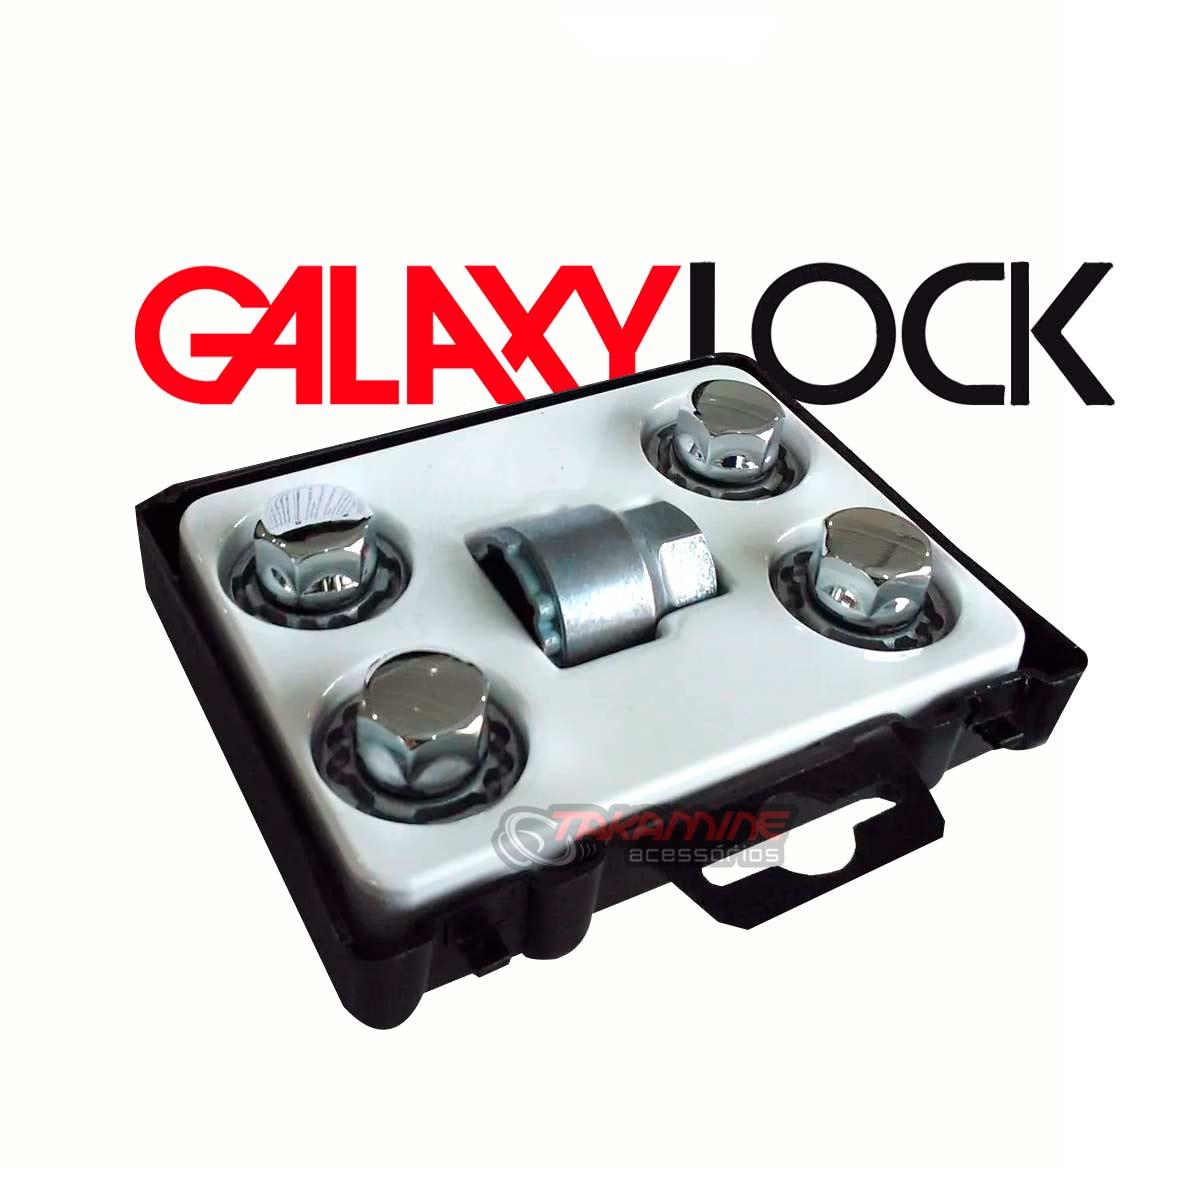 Porca antifurto para rodas Galaxy Lock Livina 2007 até 2014 DNL/M